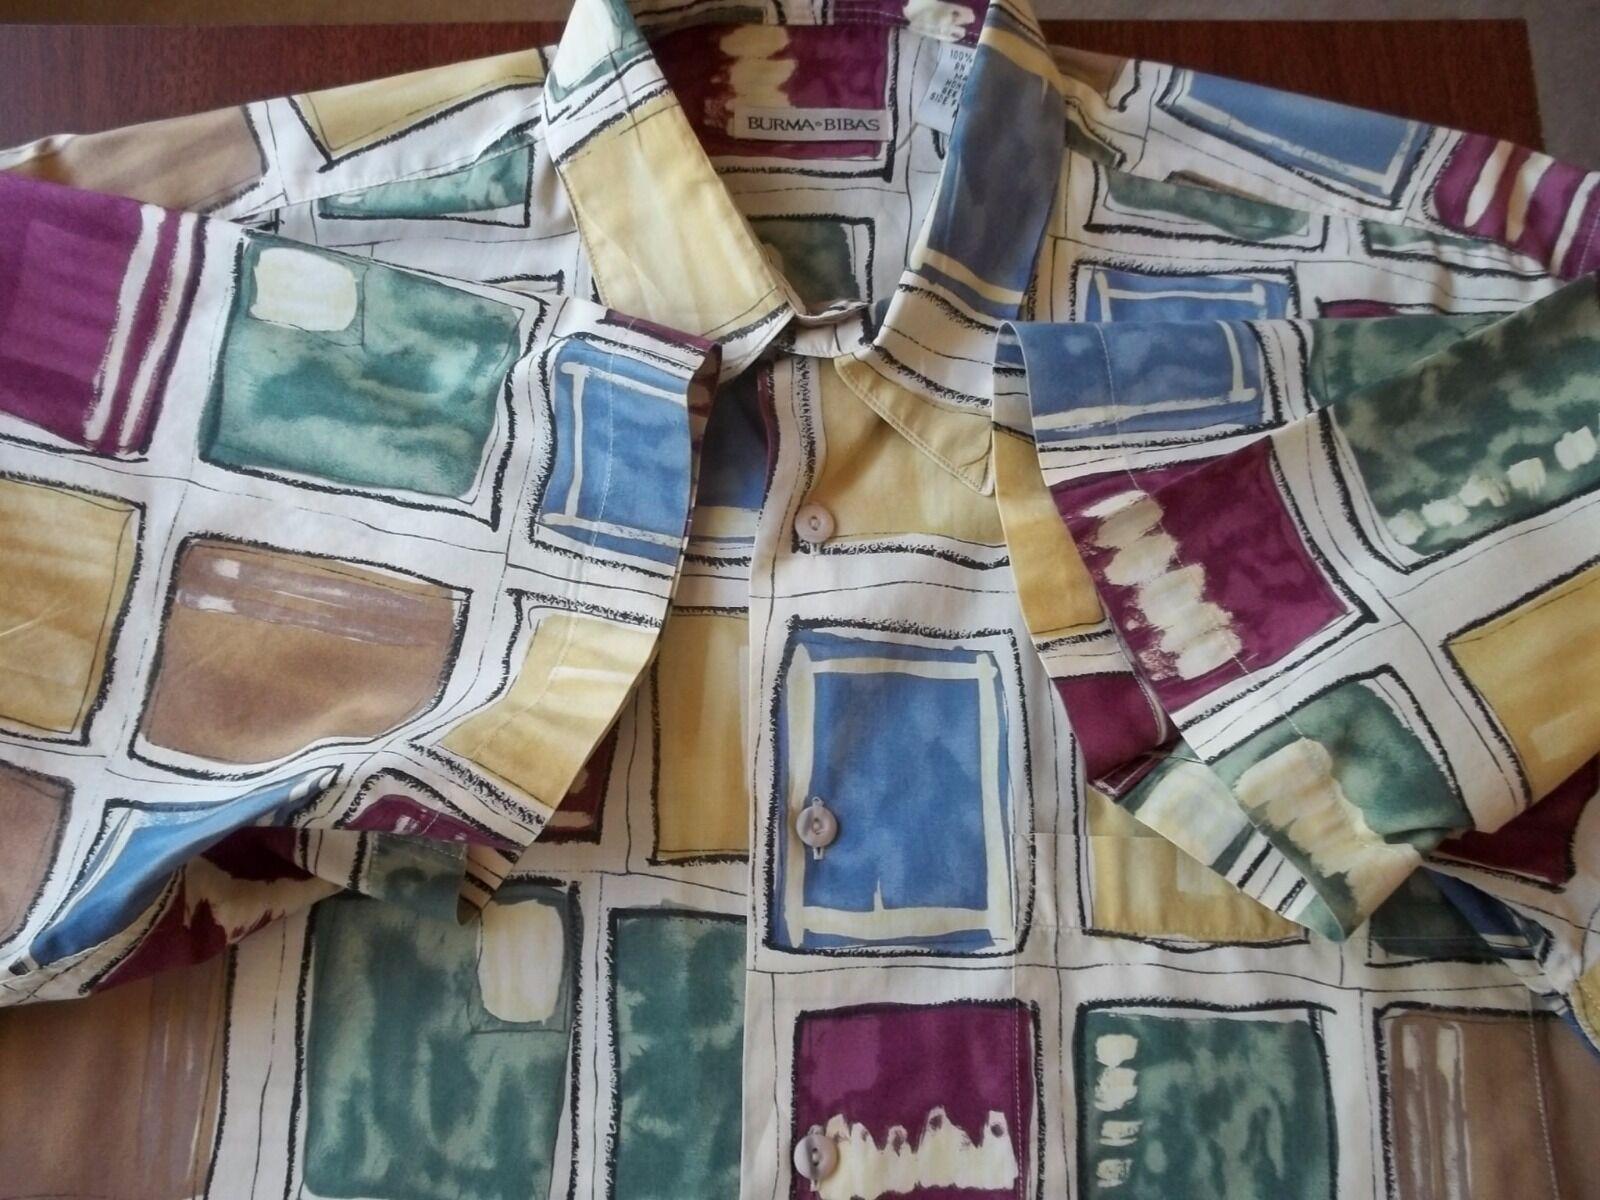 Burma Bibas M casual 100% soft cotton short sleeve button front multi-color